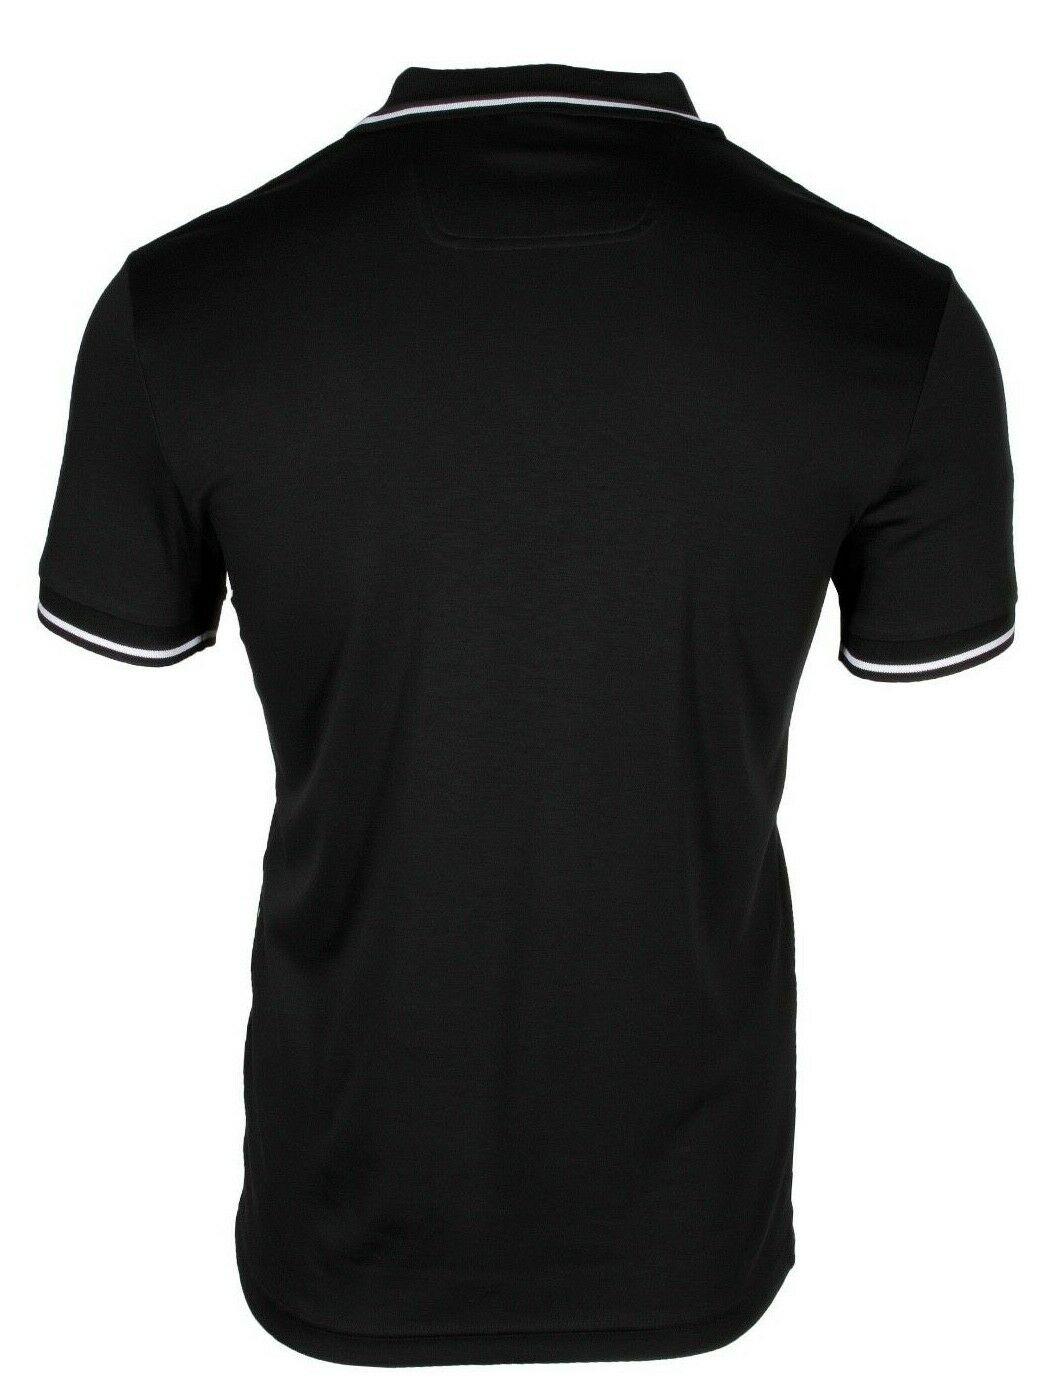 674d30588 HUGO BOSS Paule 1 Men's Short Sleeve Slim Fit Polo Shirt Black ...